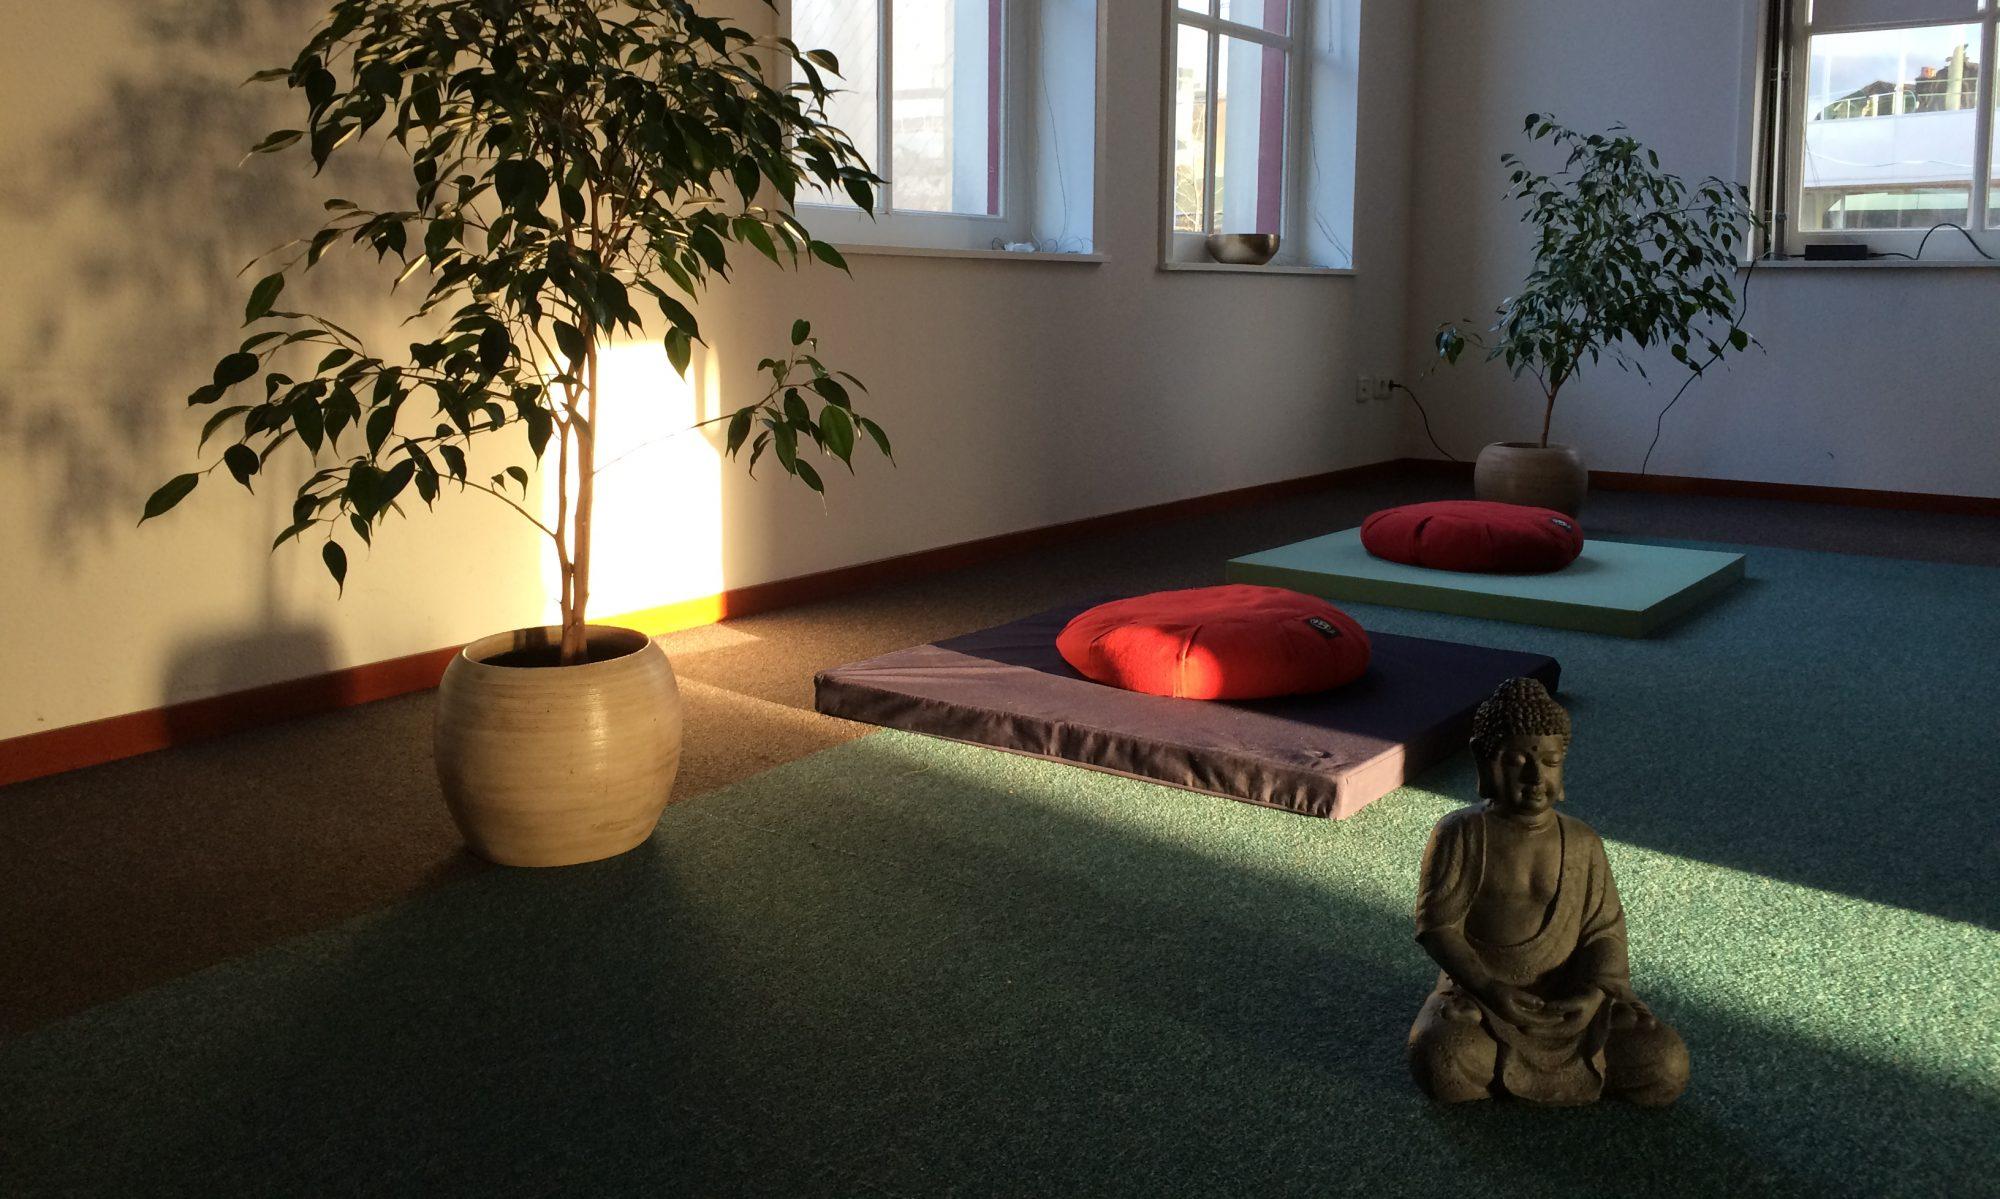 Inward meditatiecentrum